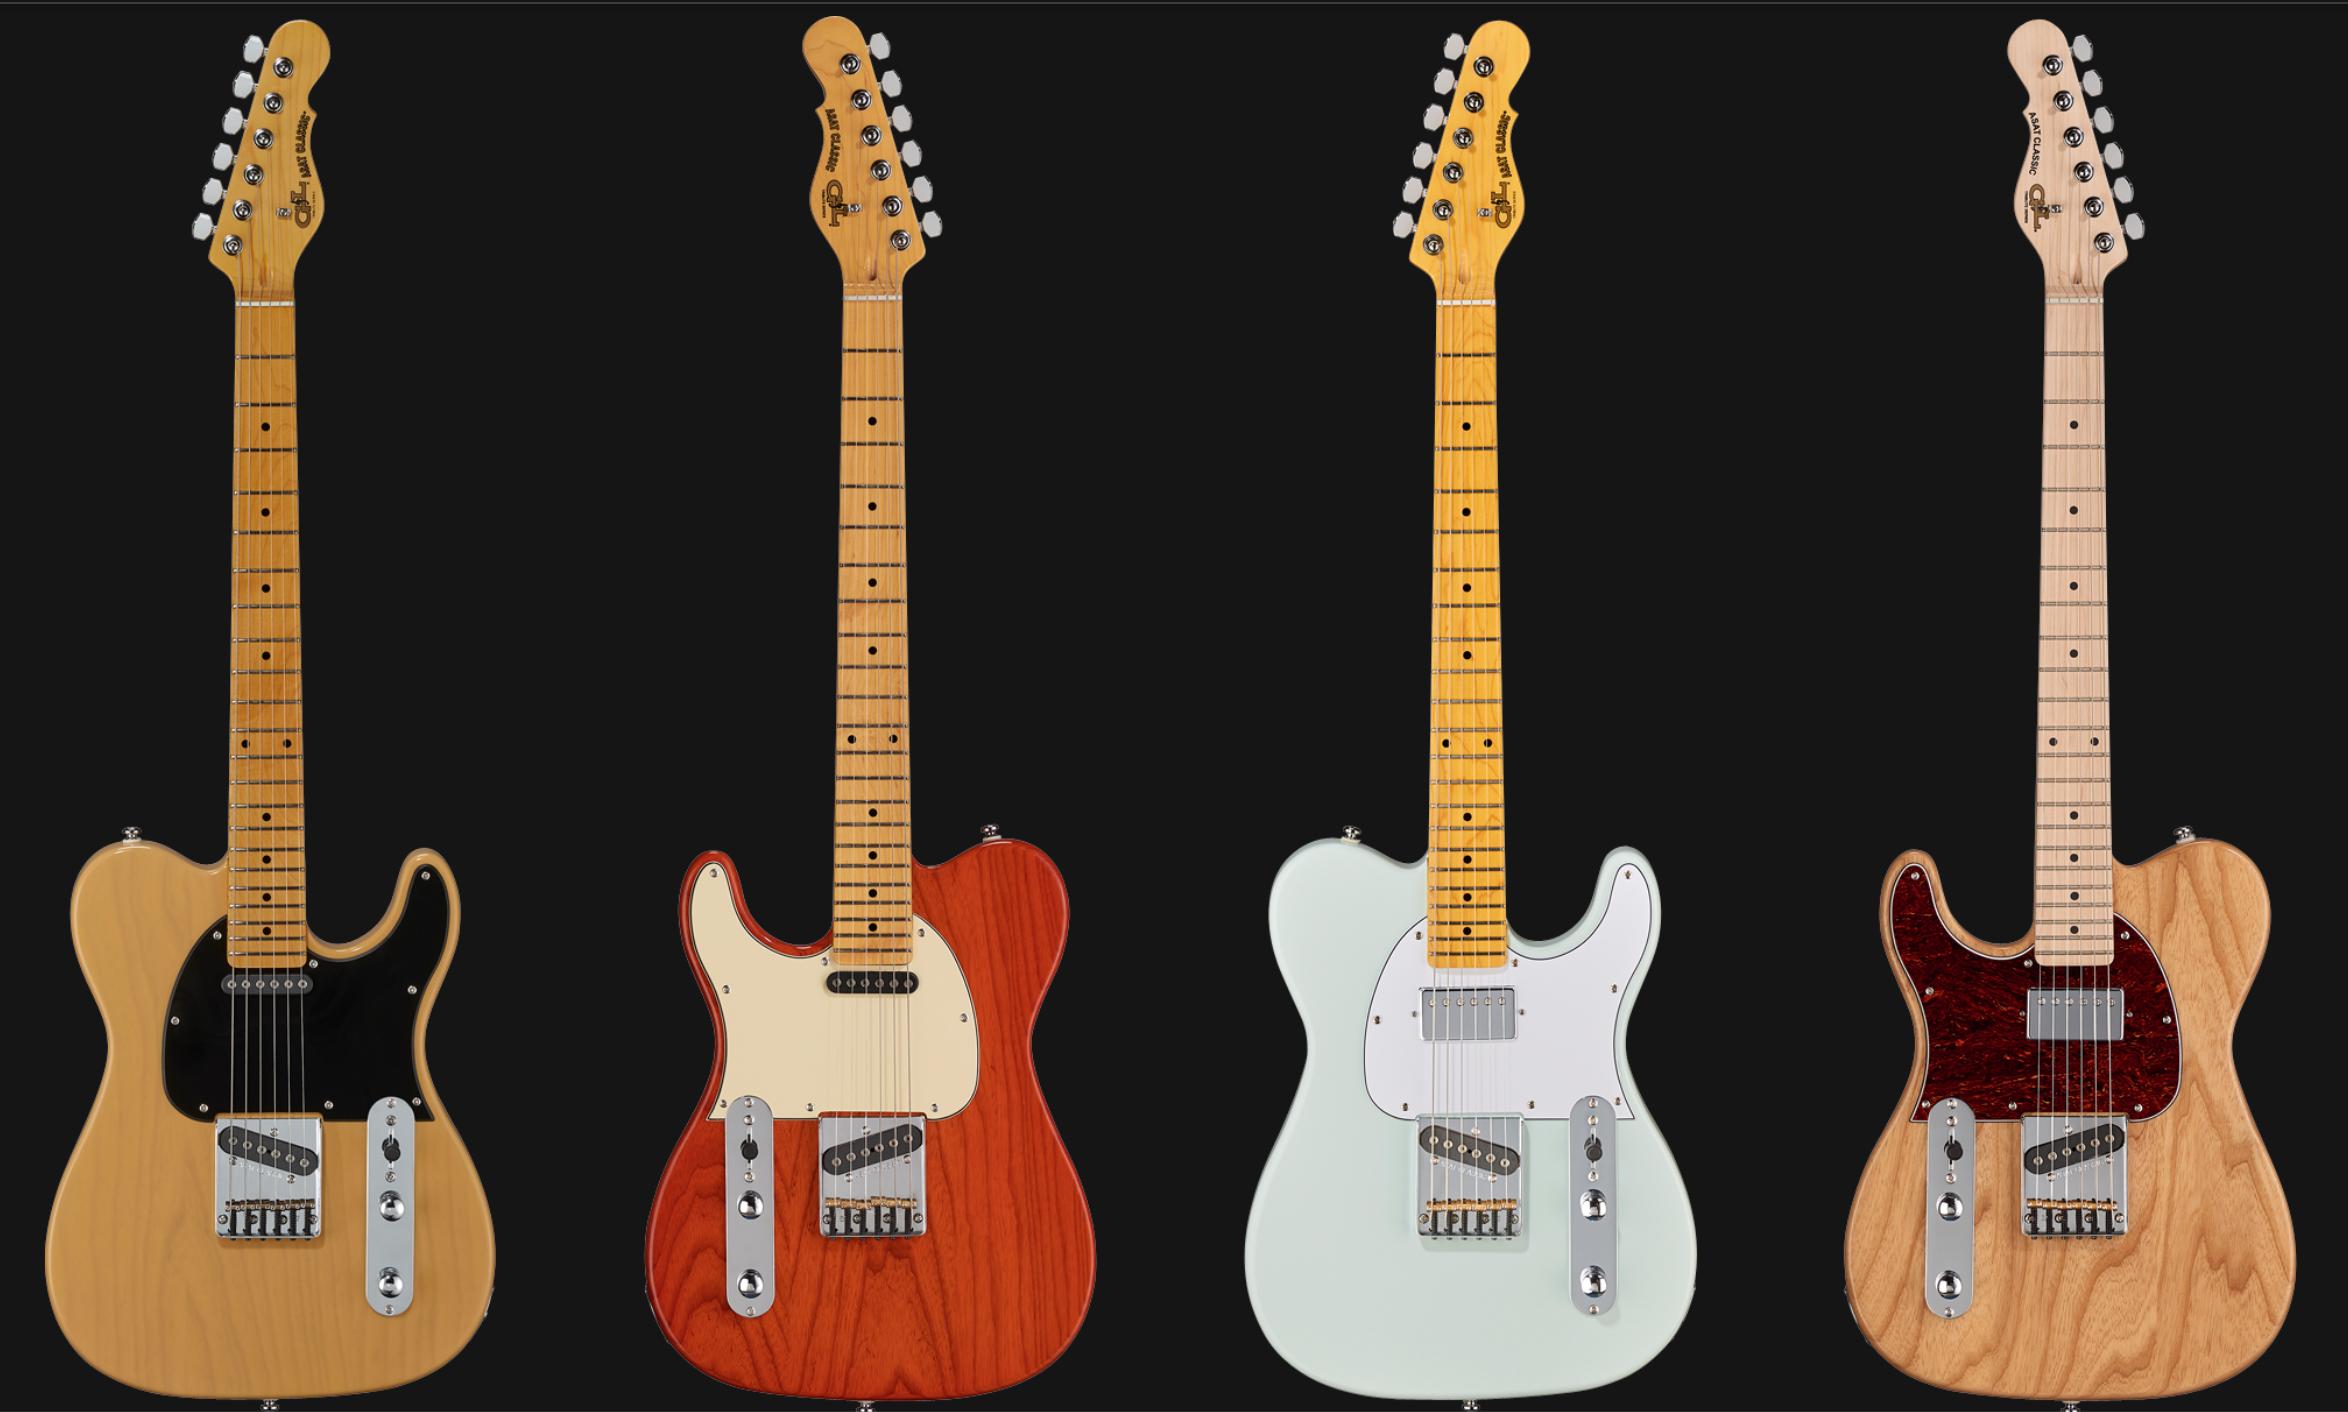 Modelos de la Tribute Series actuales de G&L (obtenido de http://glguitars.com/product-category/tribute-guitars/)